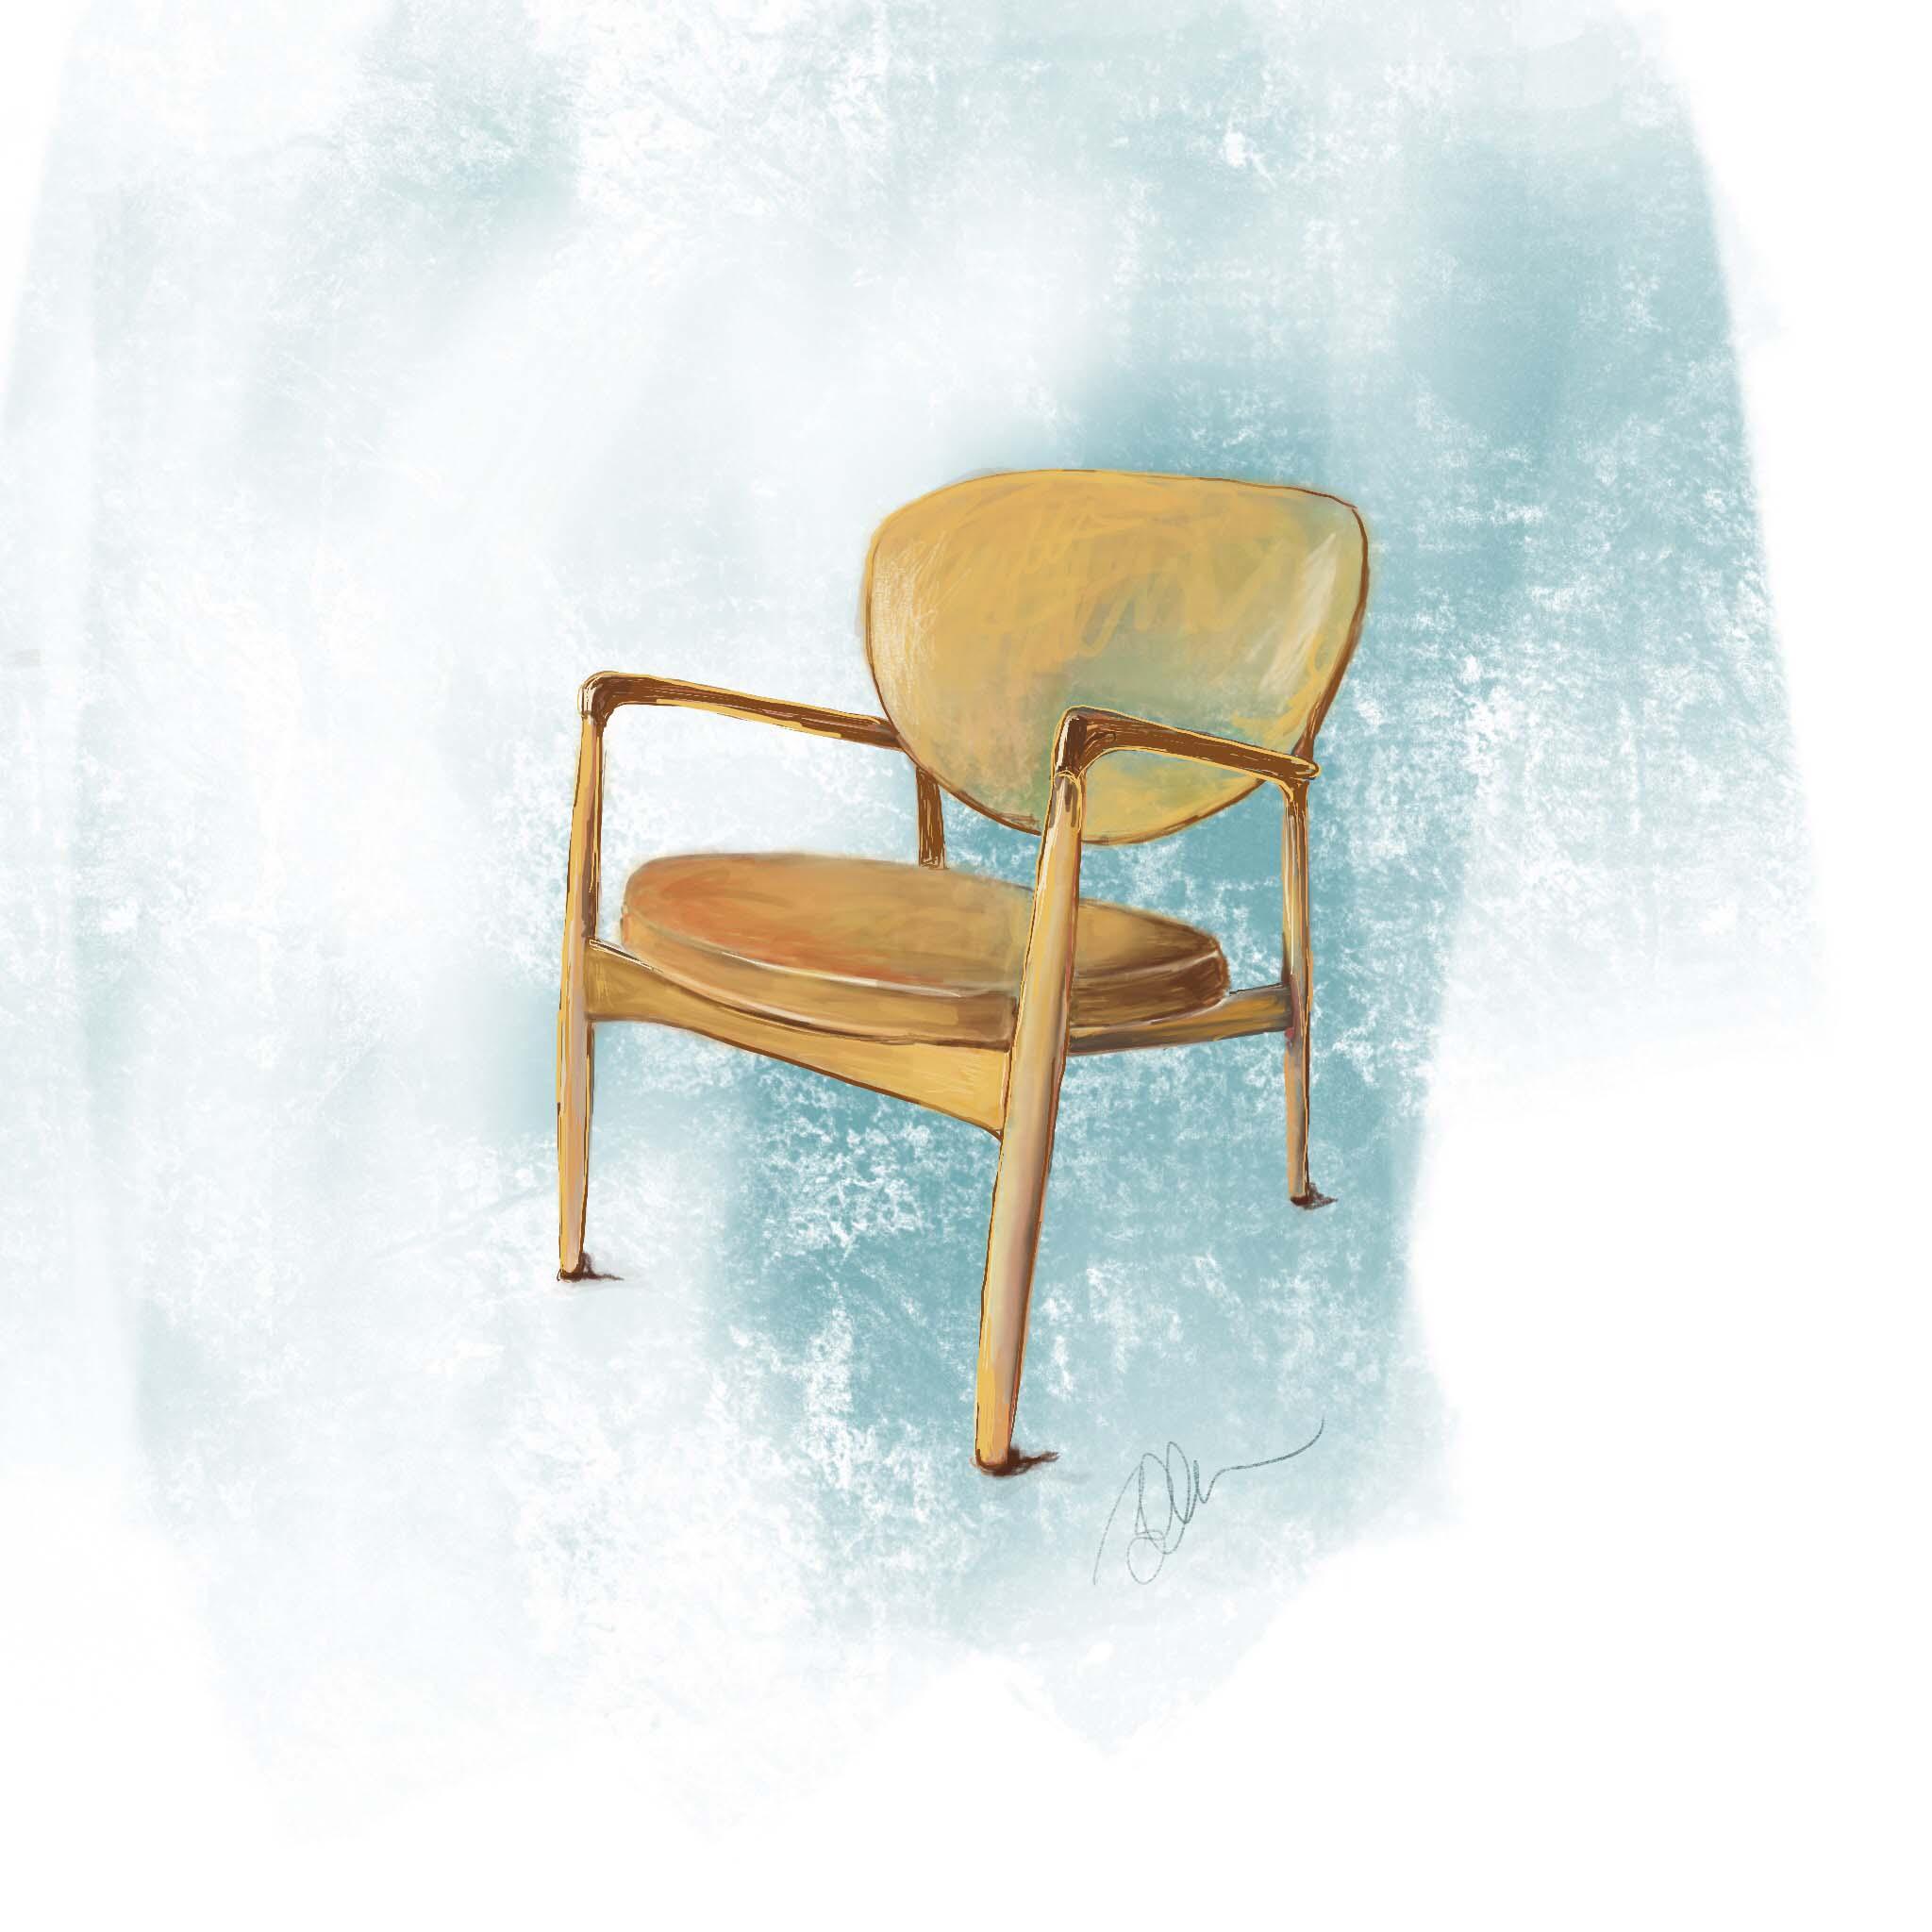 Danish designer Ib Kofod-Larsen, armchair ~ Digital Art ©Beth Ortman